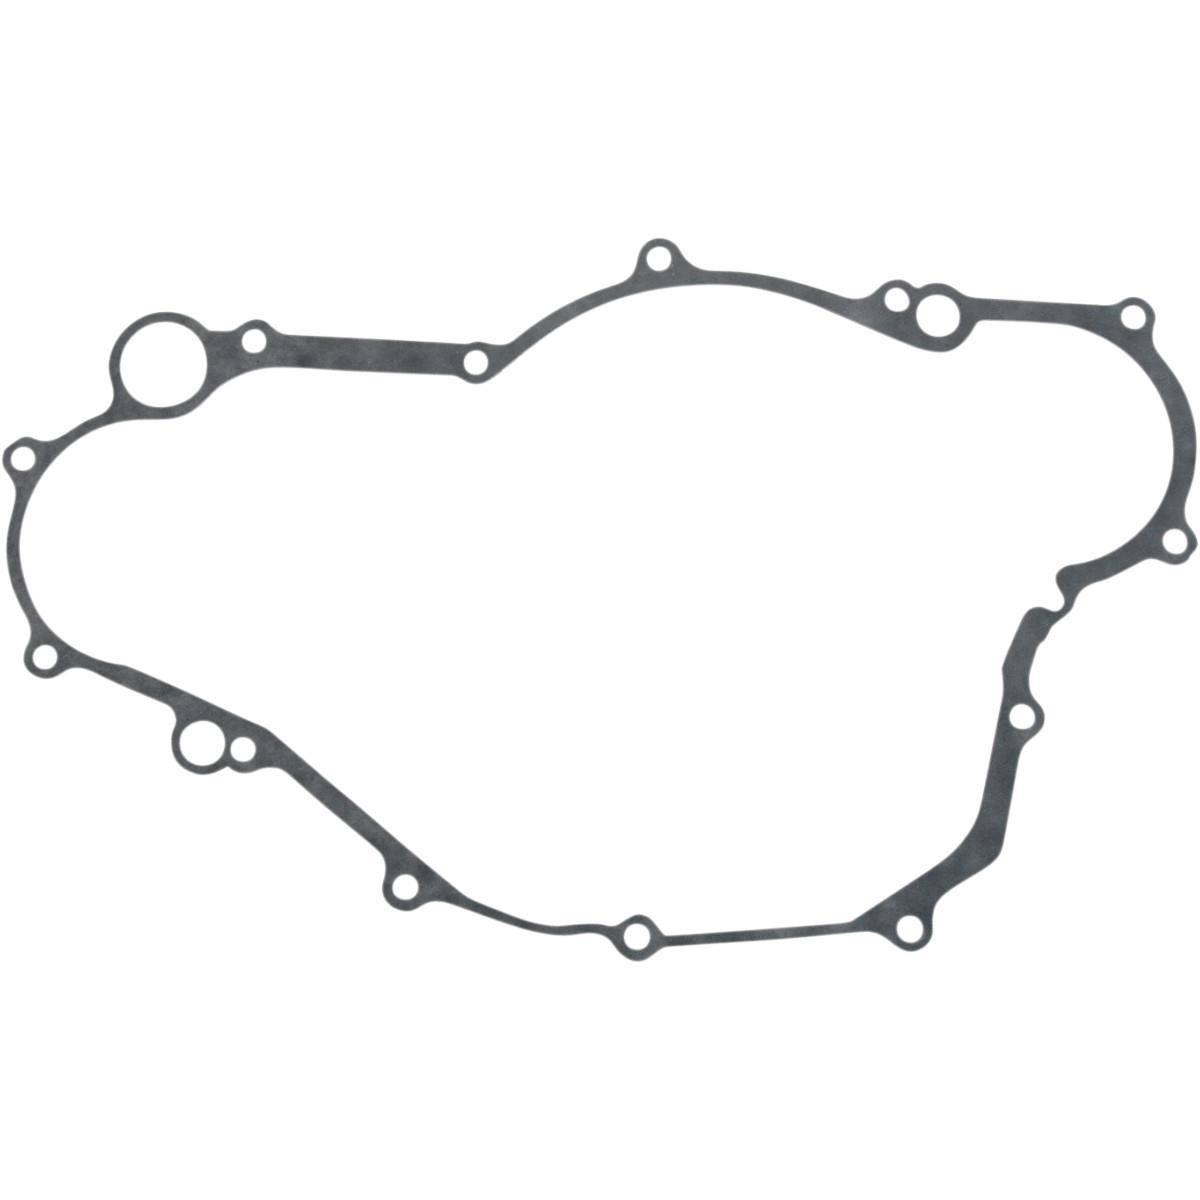 Moose Racing Clutch Cover Gasket 0934-1412